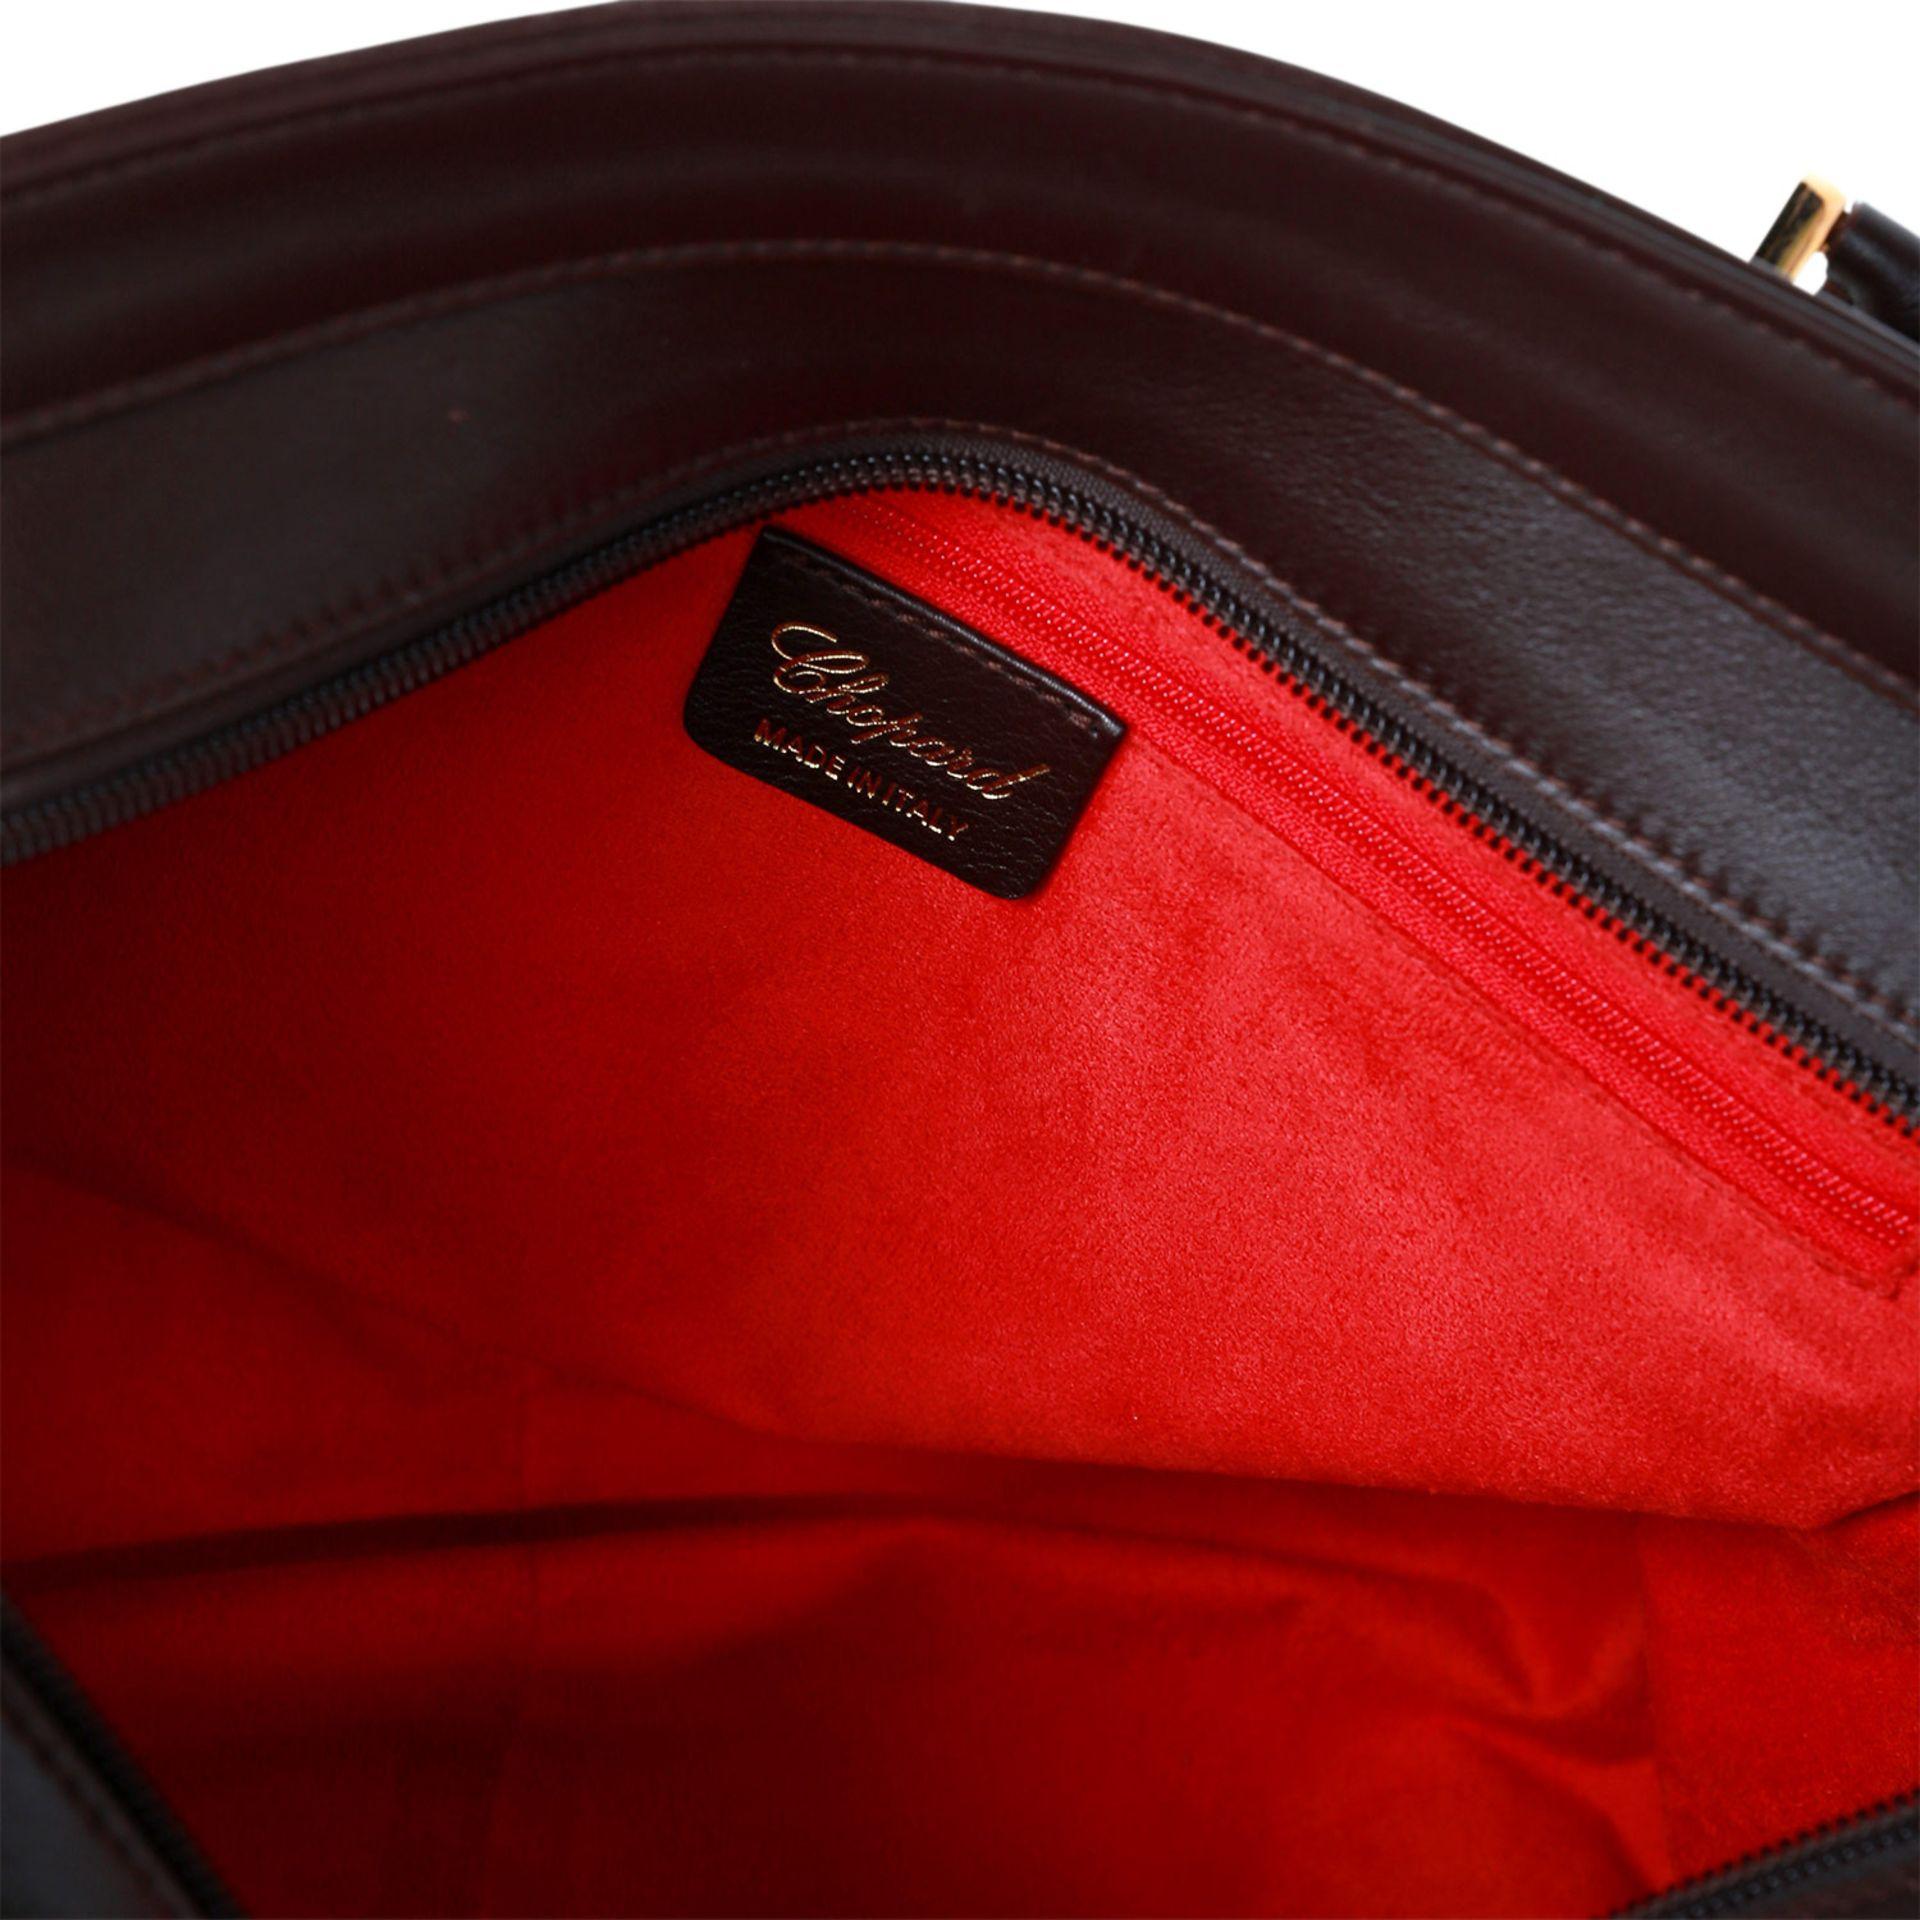 CHOPARD GENÈVE Henkeltasche. Bowlingbagform aus perlweißem Textil, bordeauxfarbene Lederdetails - Bild 14 aus 14